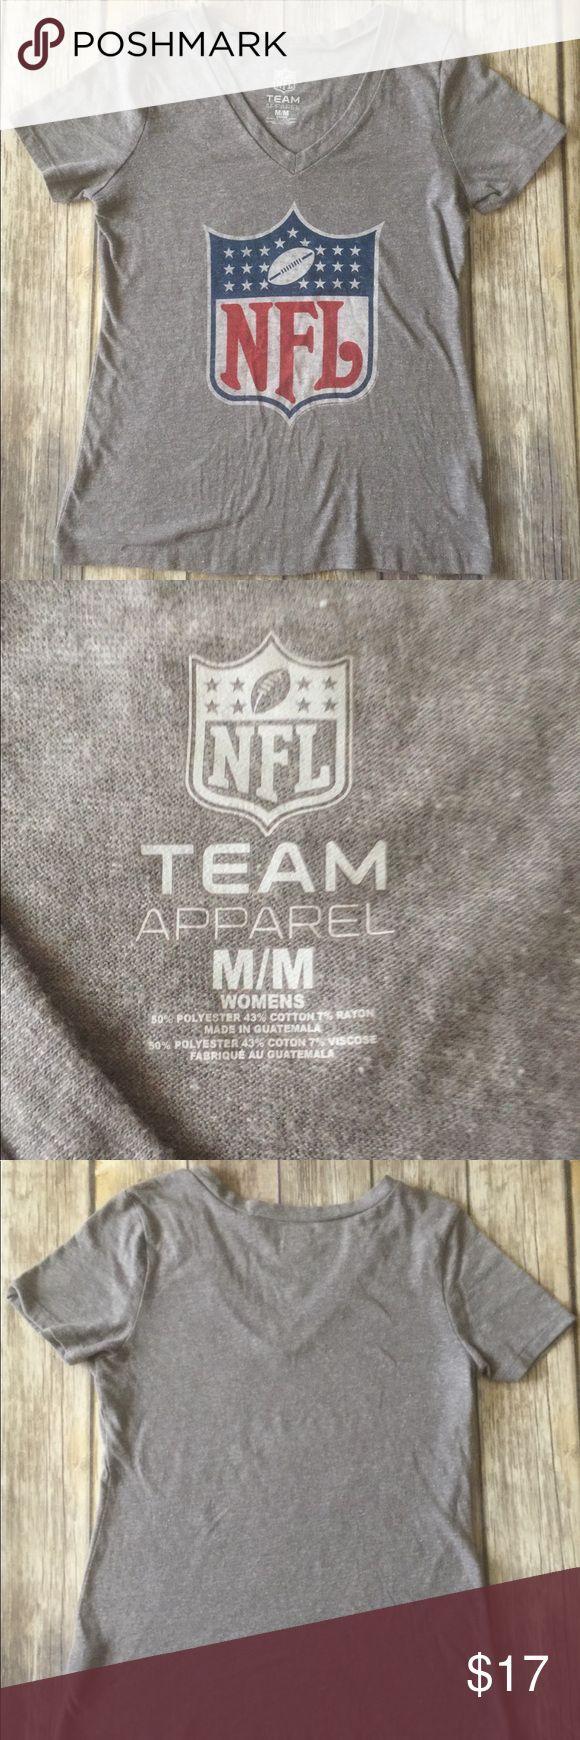 Woman's NFL Team Apparel Tee-Shirt size Medium Women's NFL Apparel tee shirt. Size Medium. Vintage style. Like new condition. NFL Apparel Tops Tees - Short Sleeve